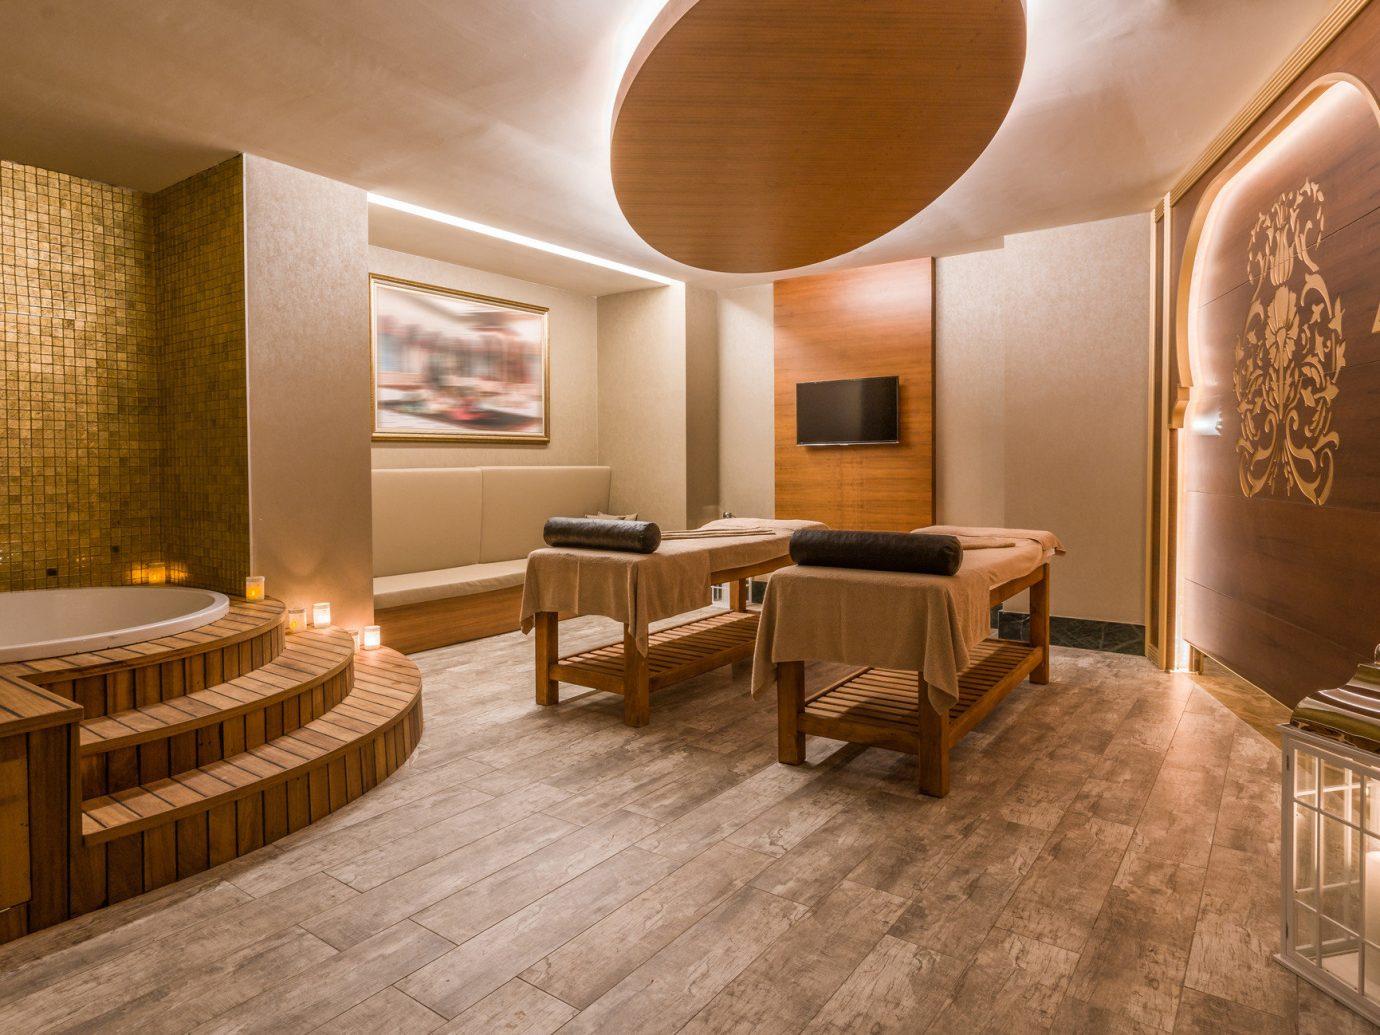 Health + Wellness Trip Ideas indoor wall floor ceiling room interior design Lobby flooring Suite real estate wood wood flooring estate interior designer hall furniture